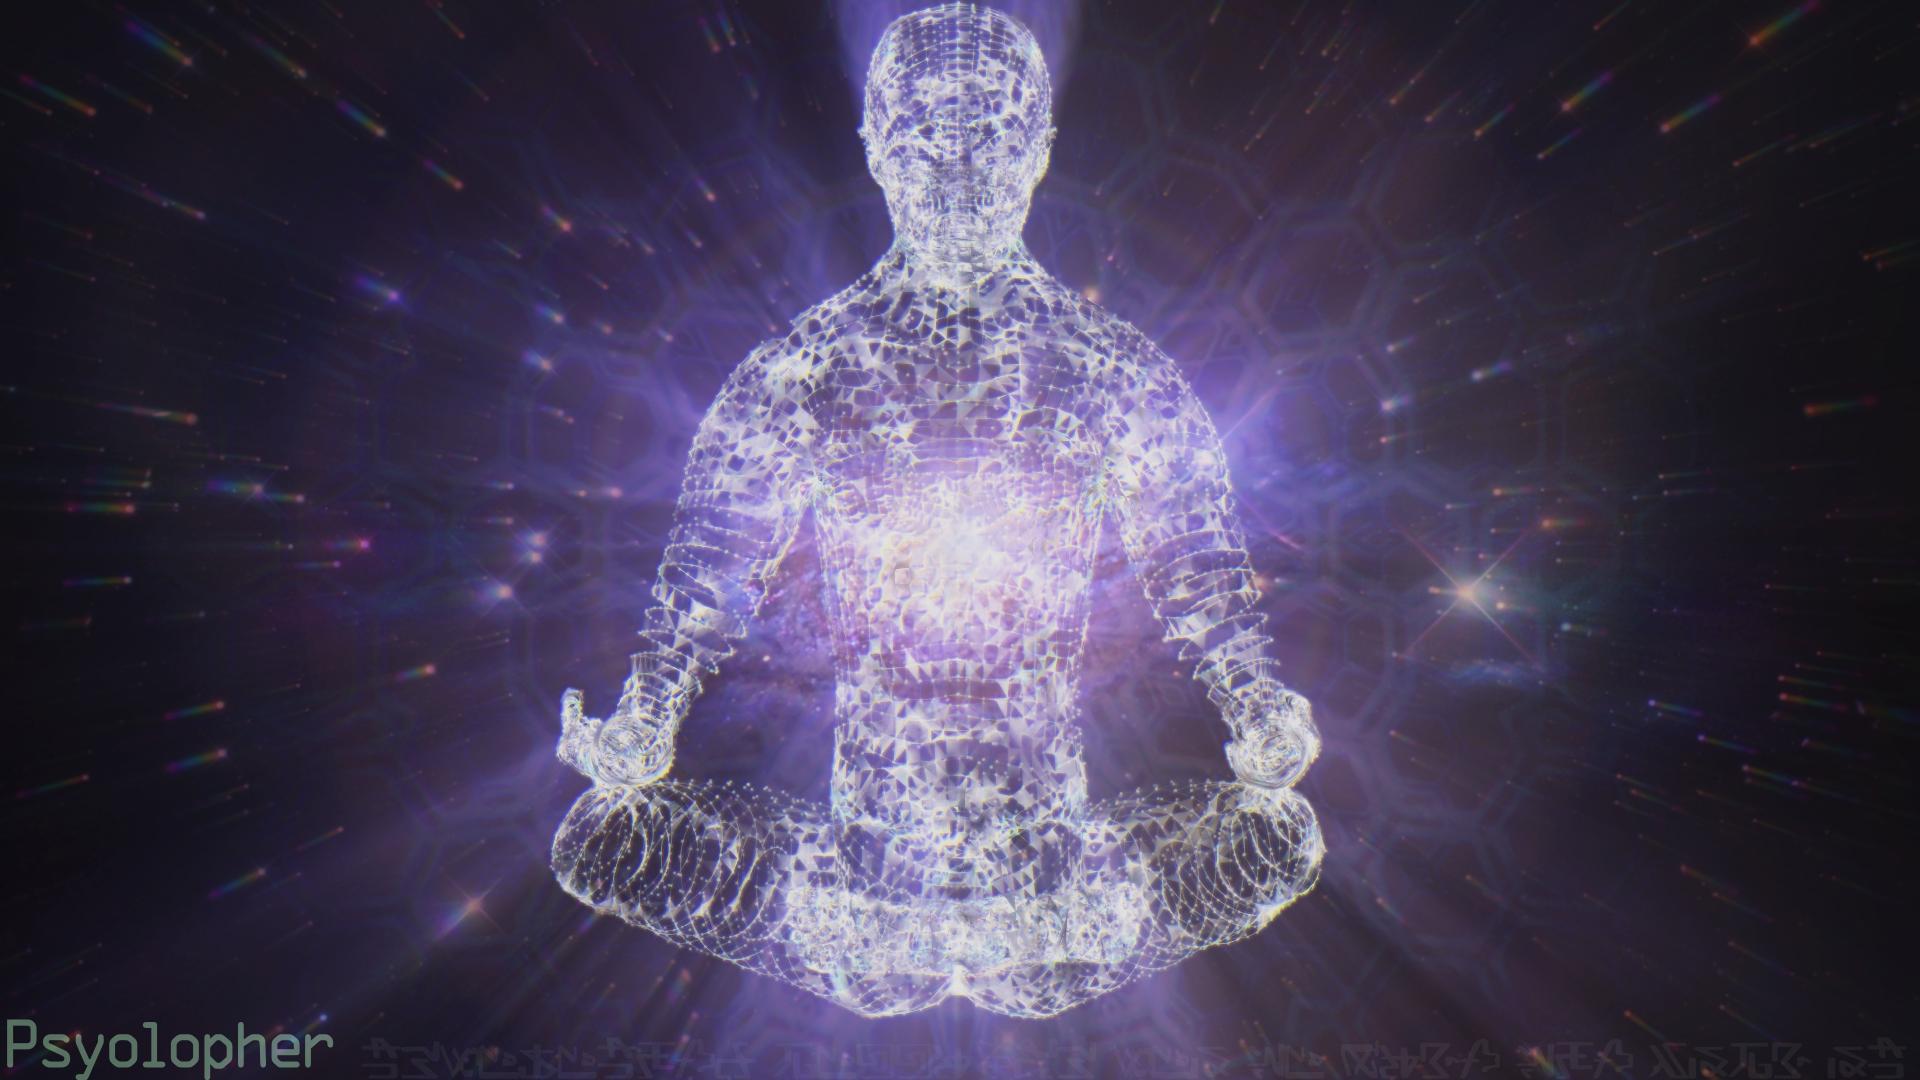 Psyolopher - Cosmic Meditation by Psyolopher on DeviantArt